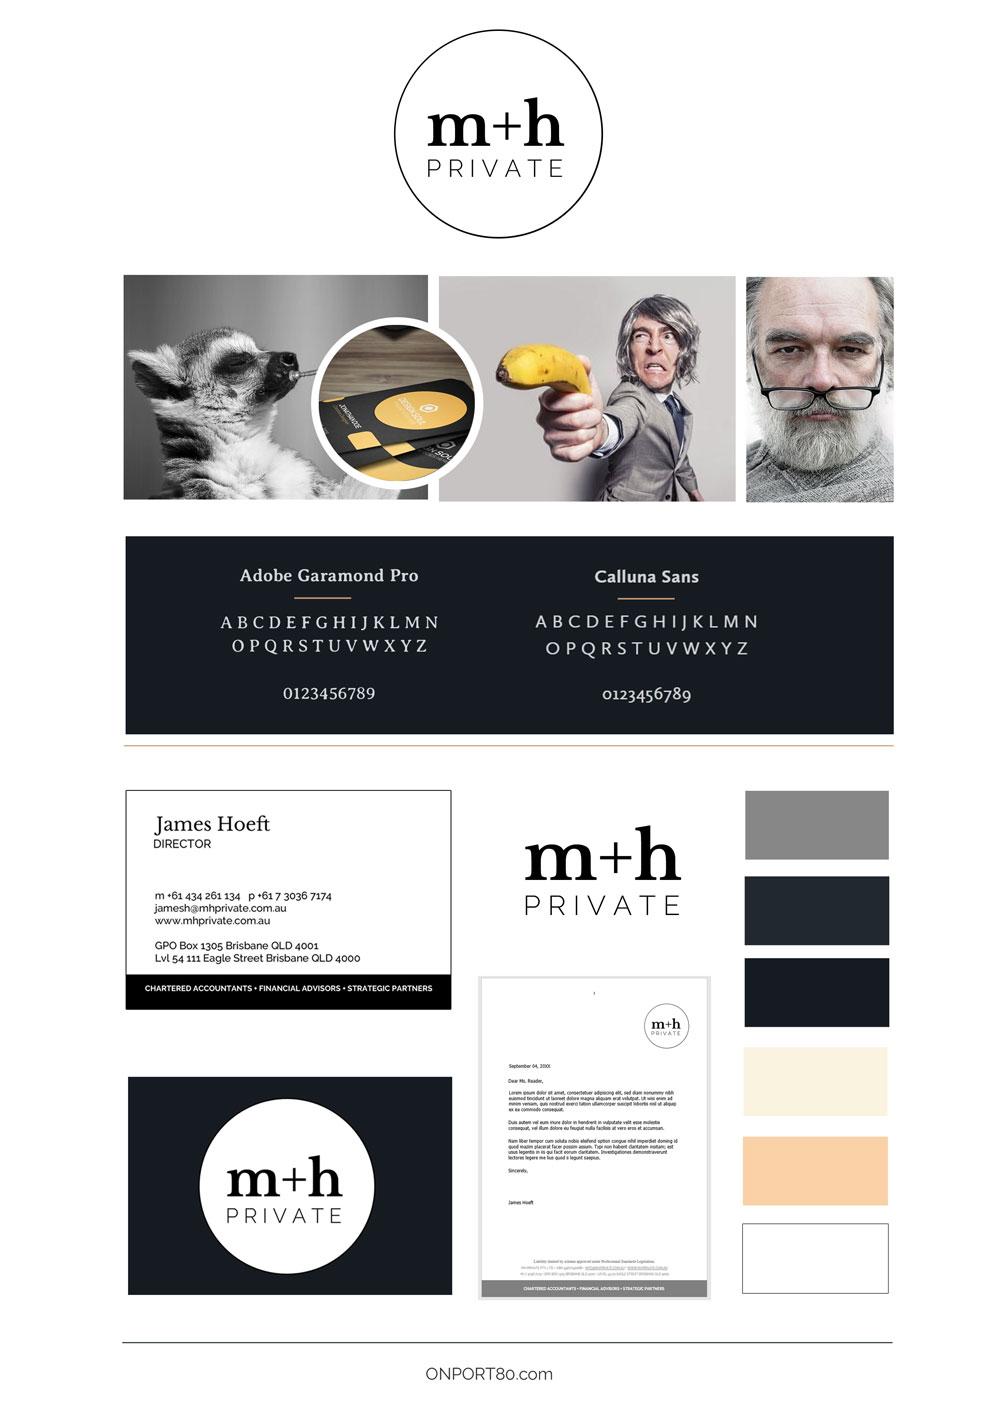 m+h-brand-style-guide.jpg